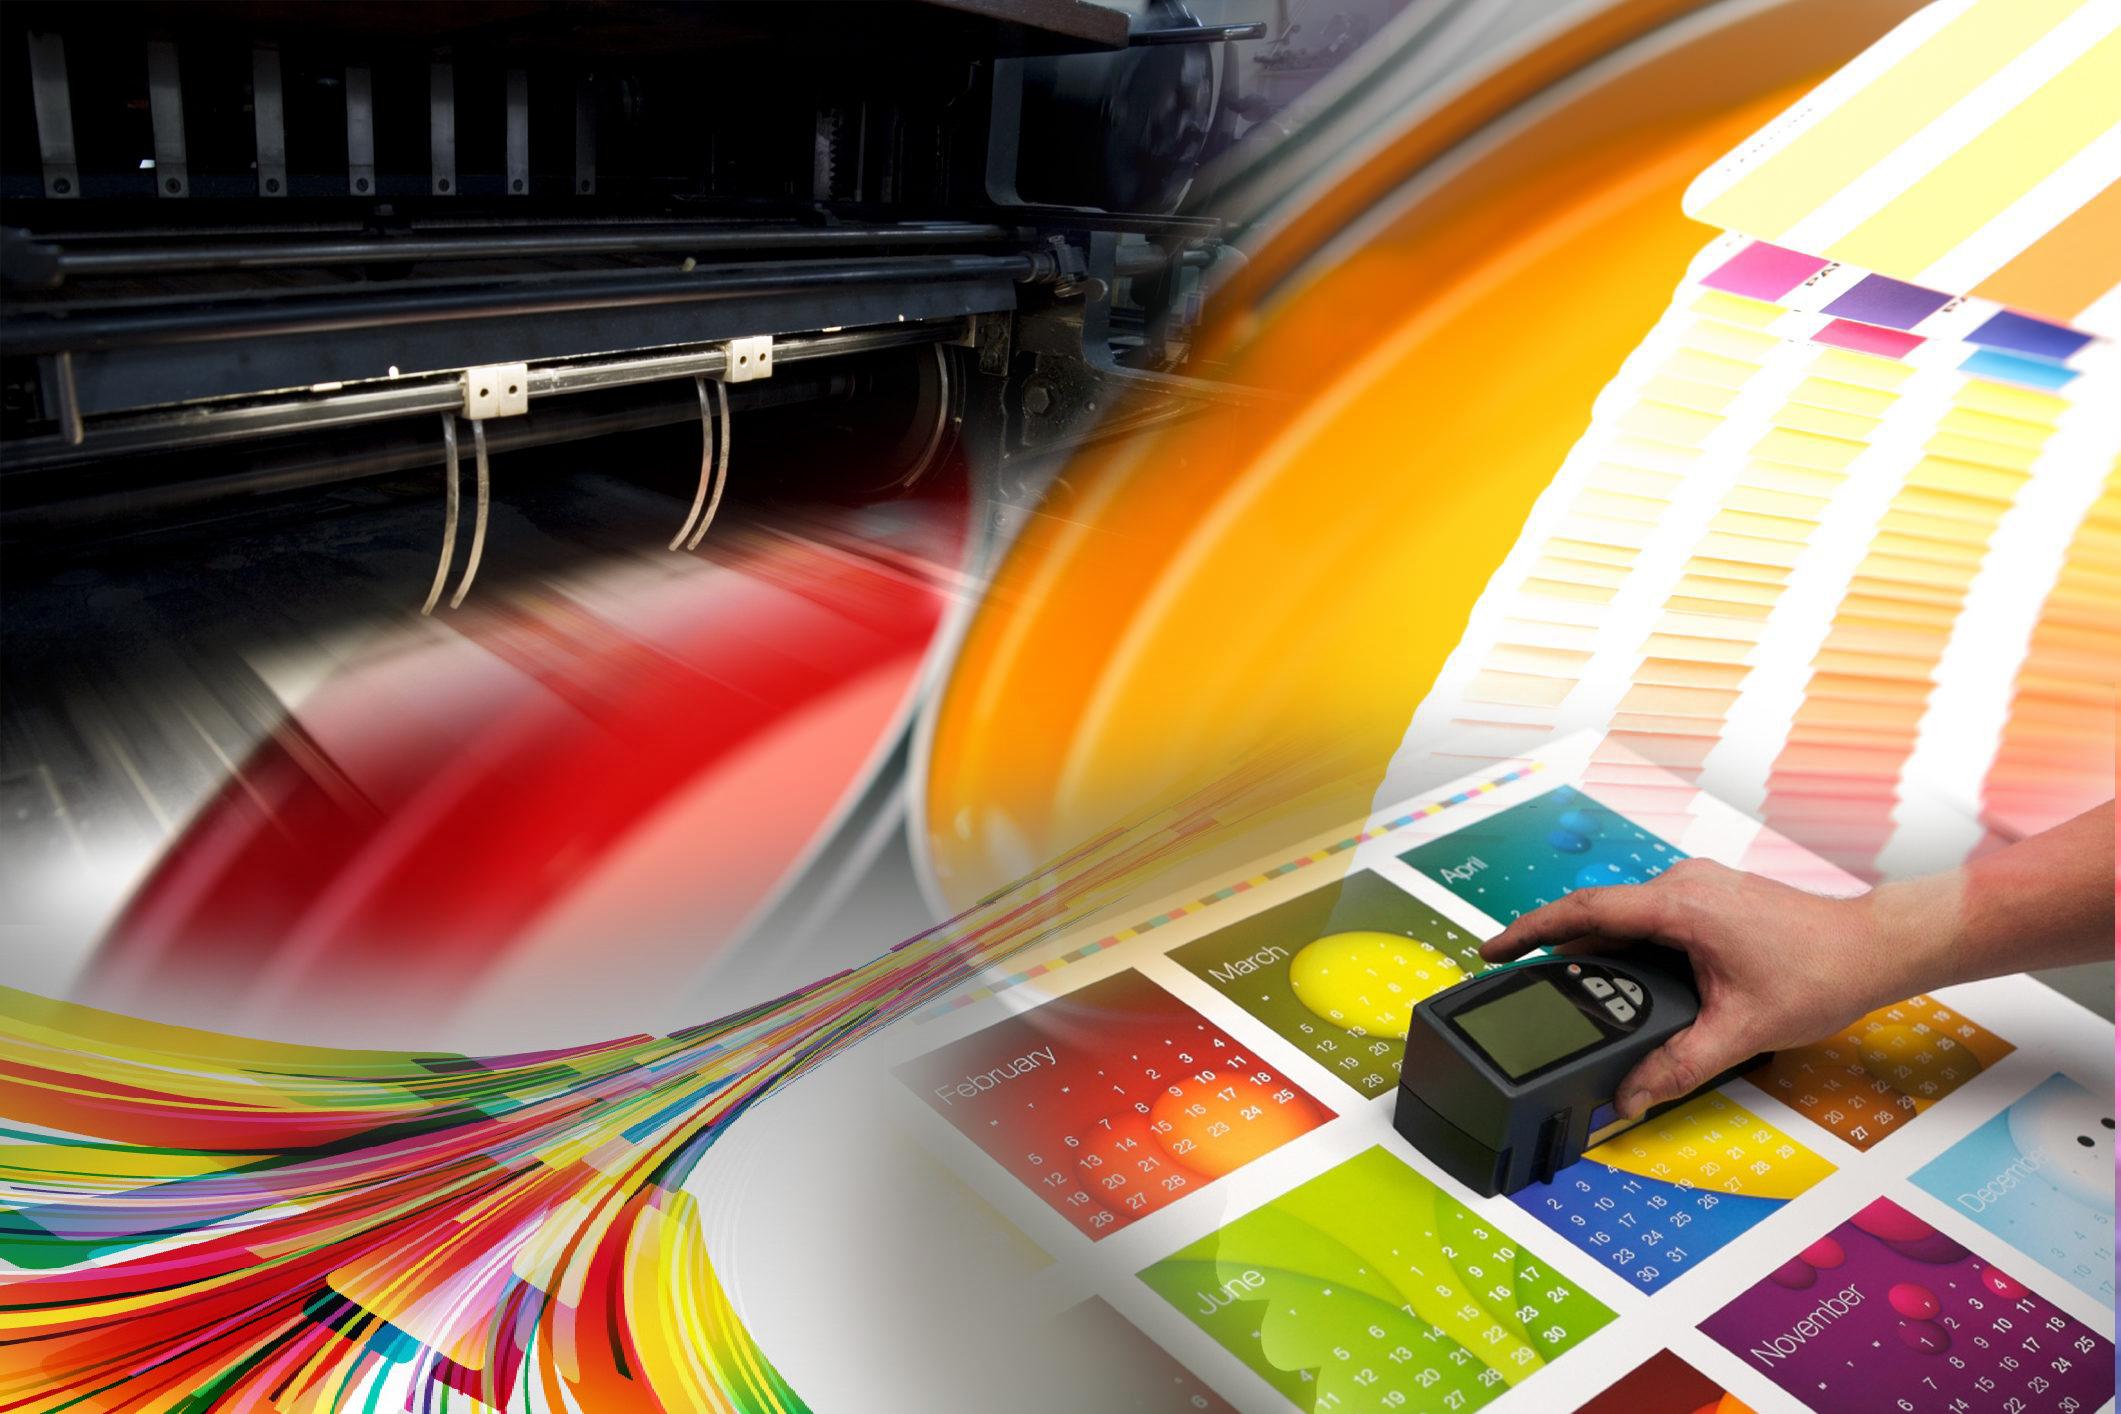 imprenta print shop altea benidorm calpe